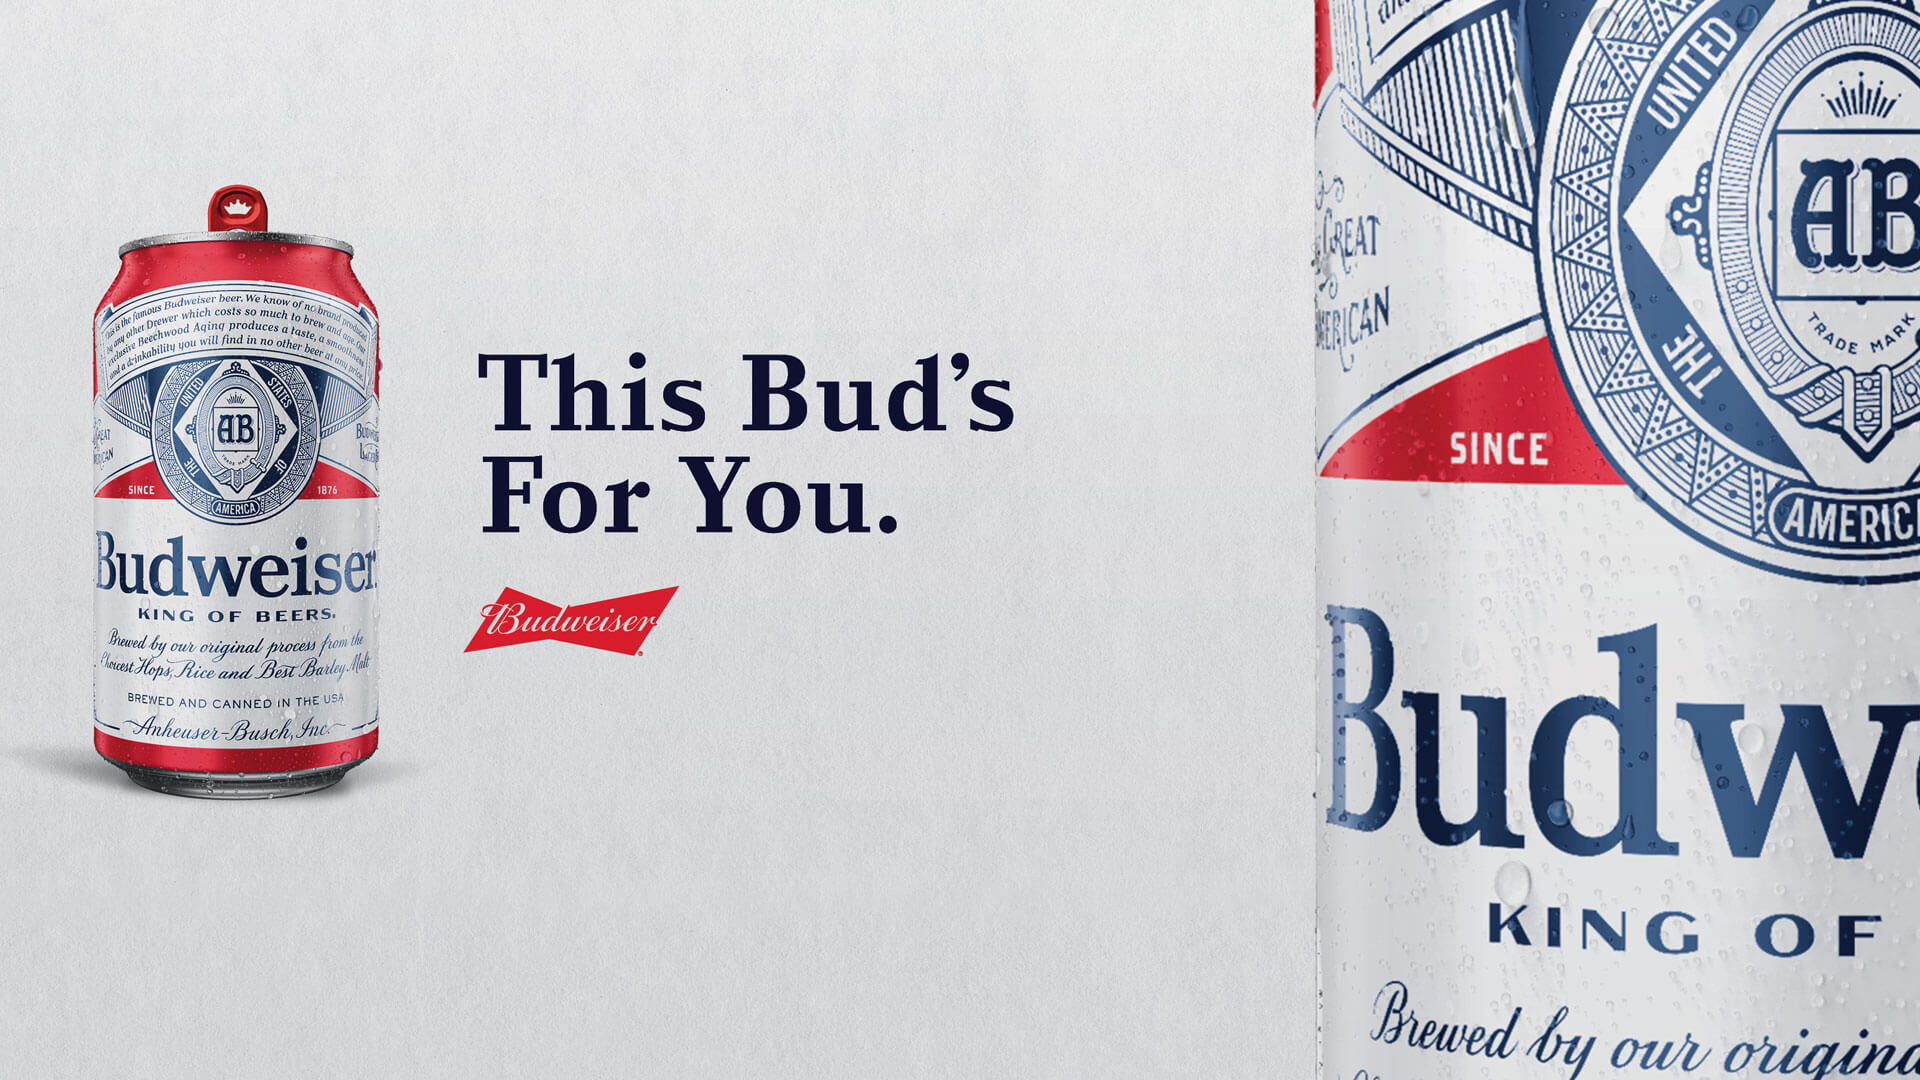 KW Beverage Columbia